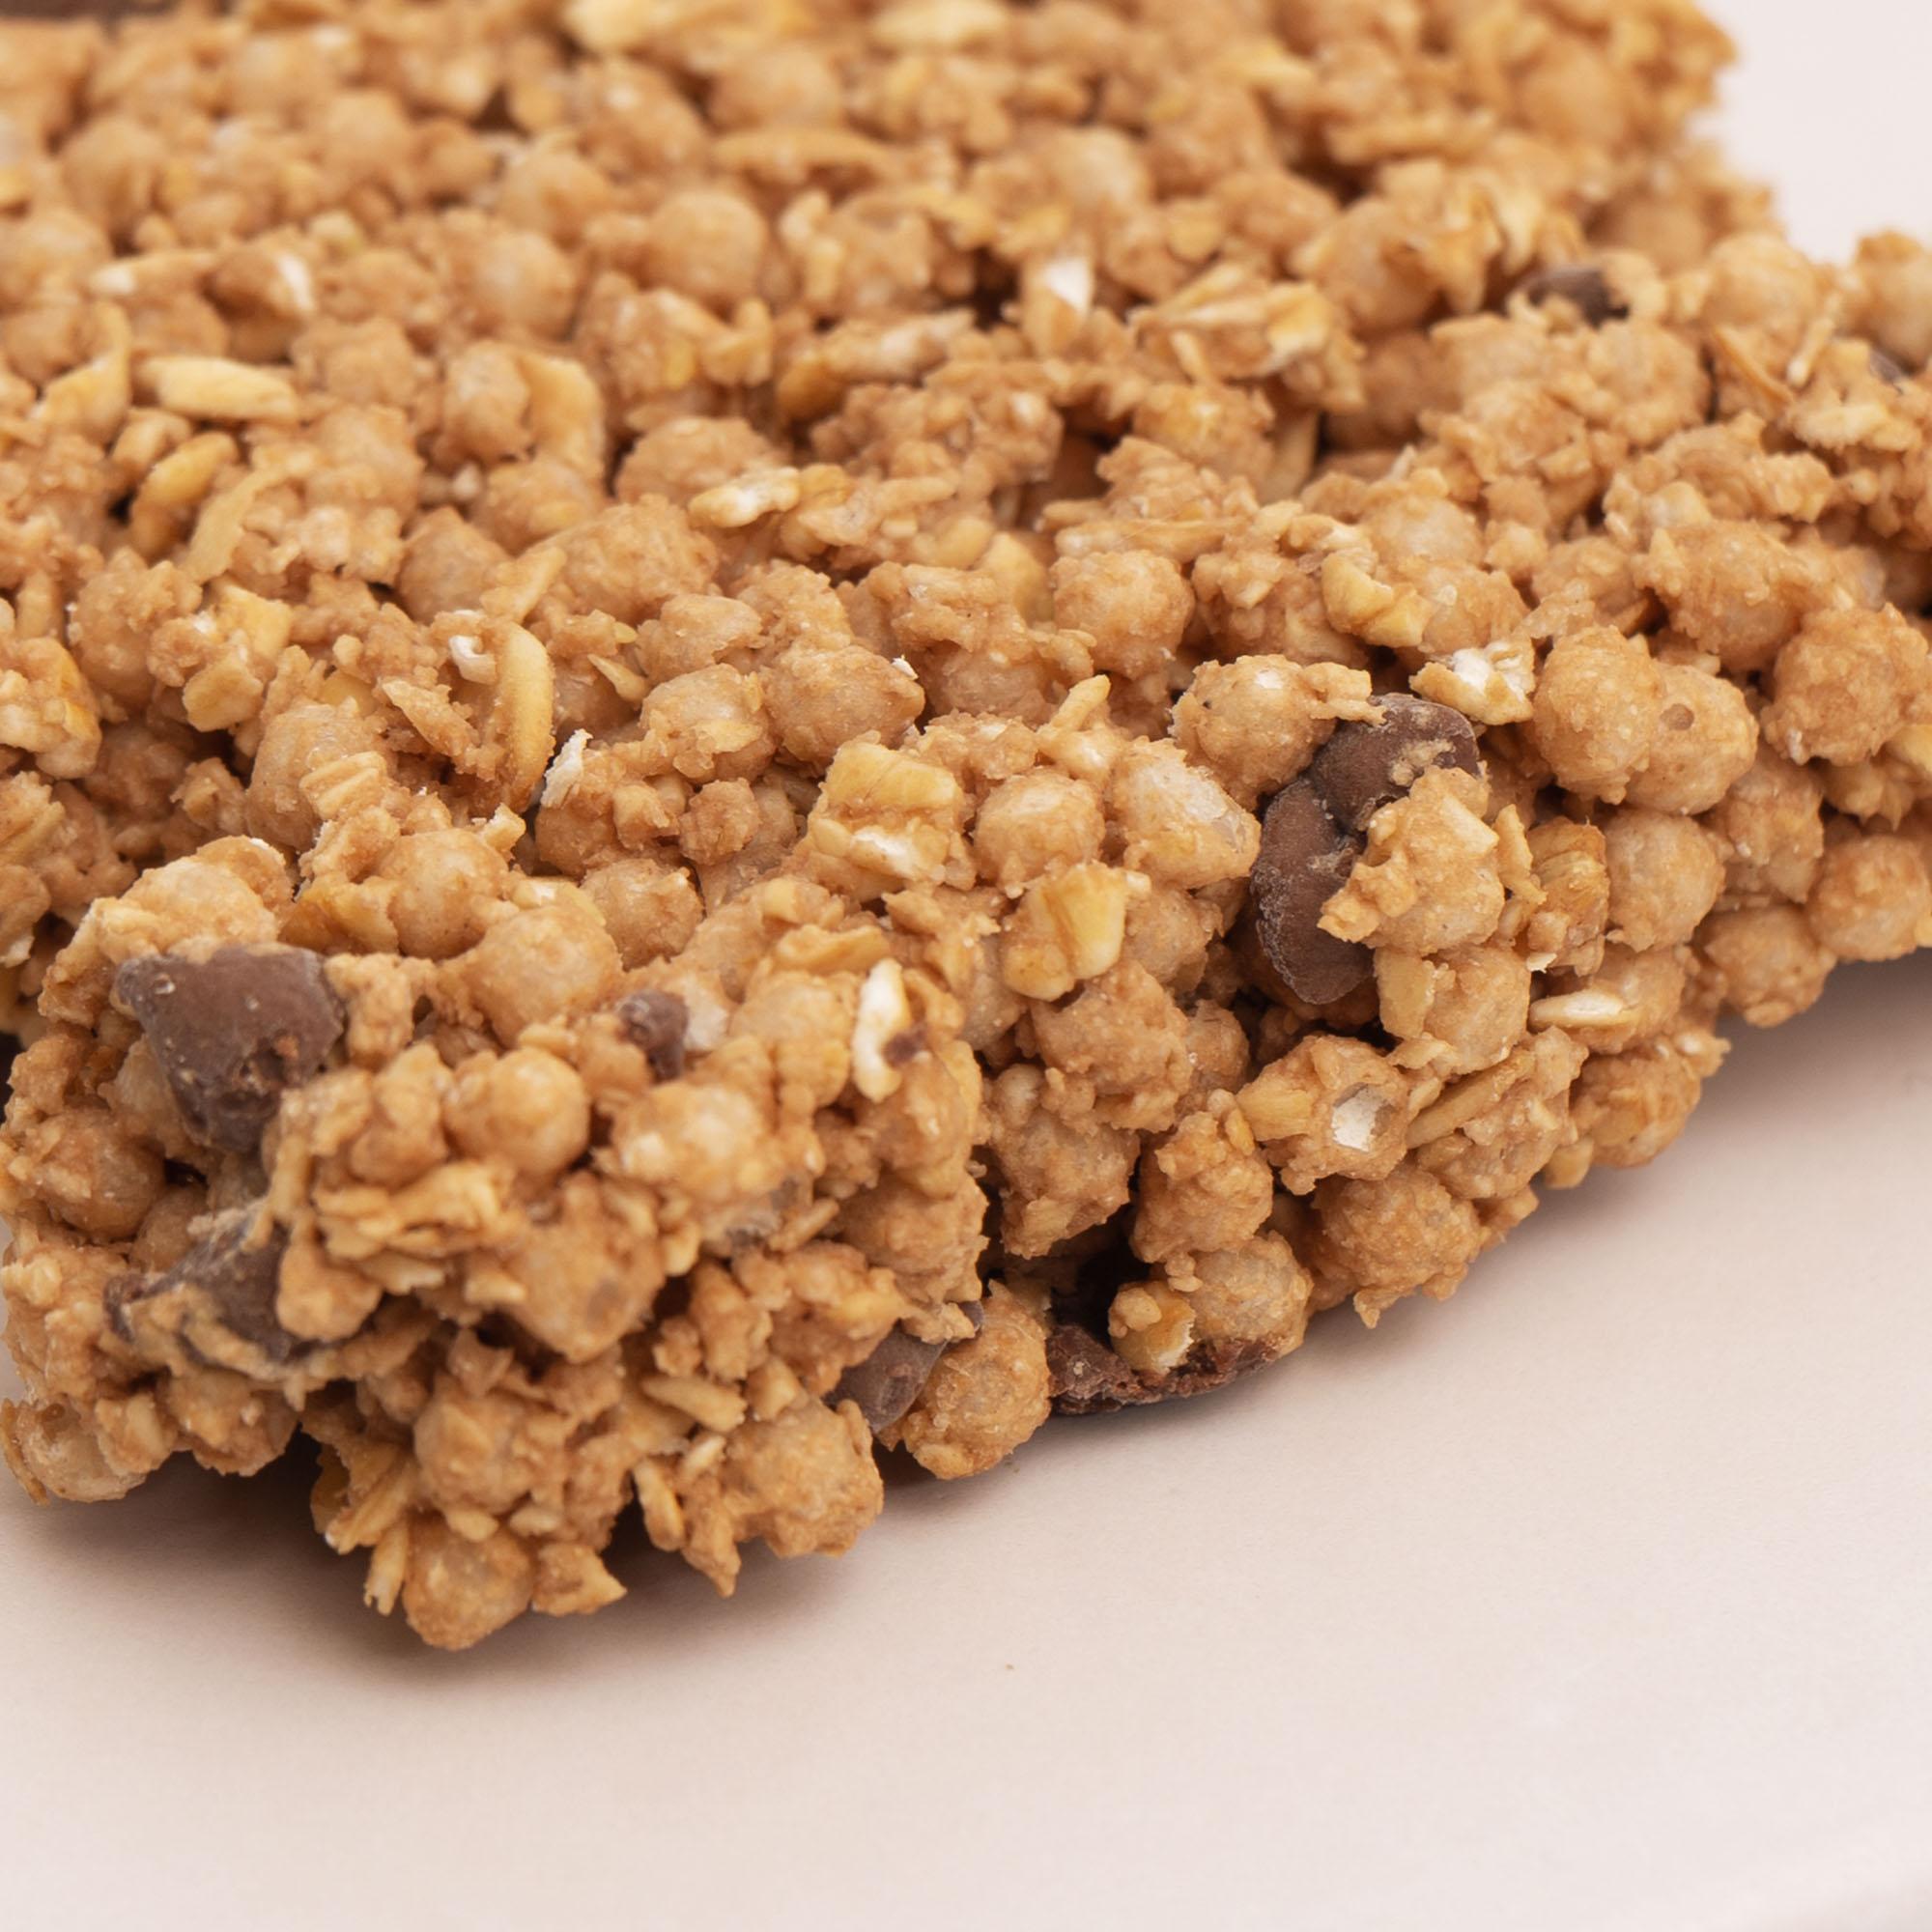 ositos cereales